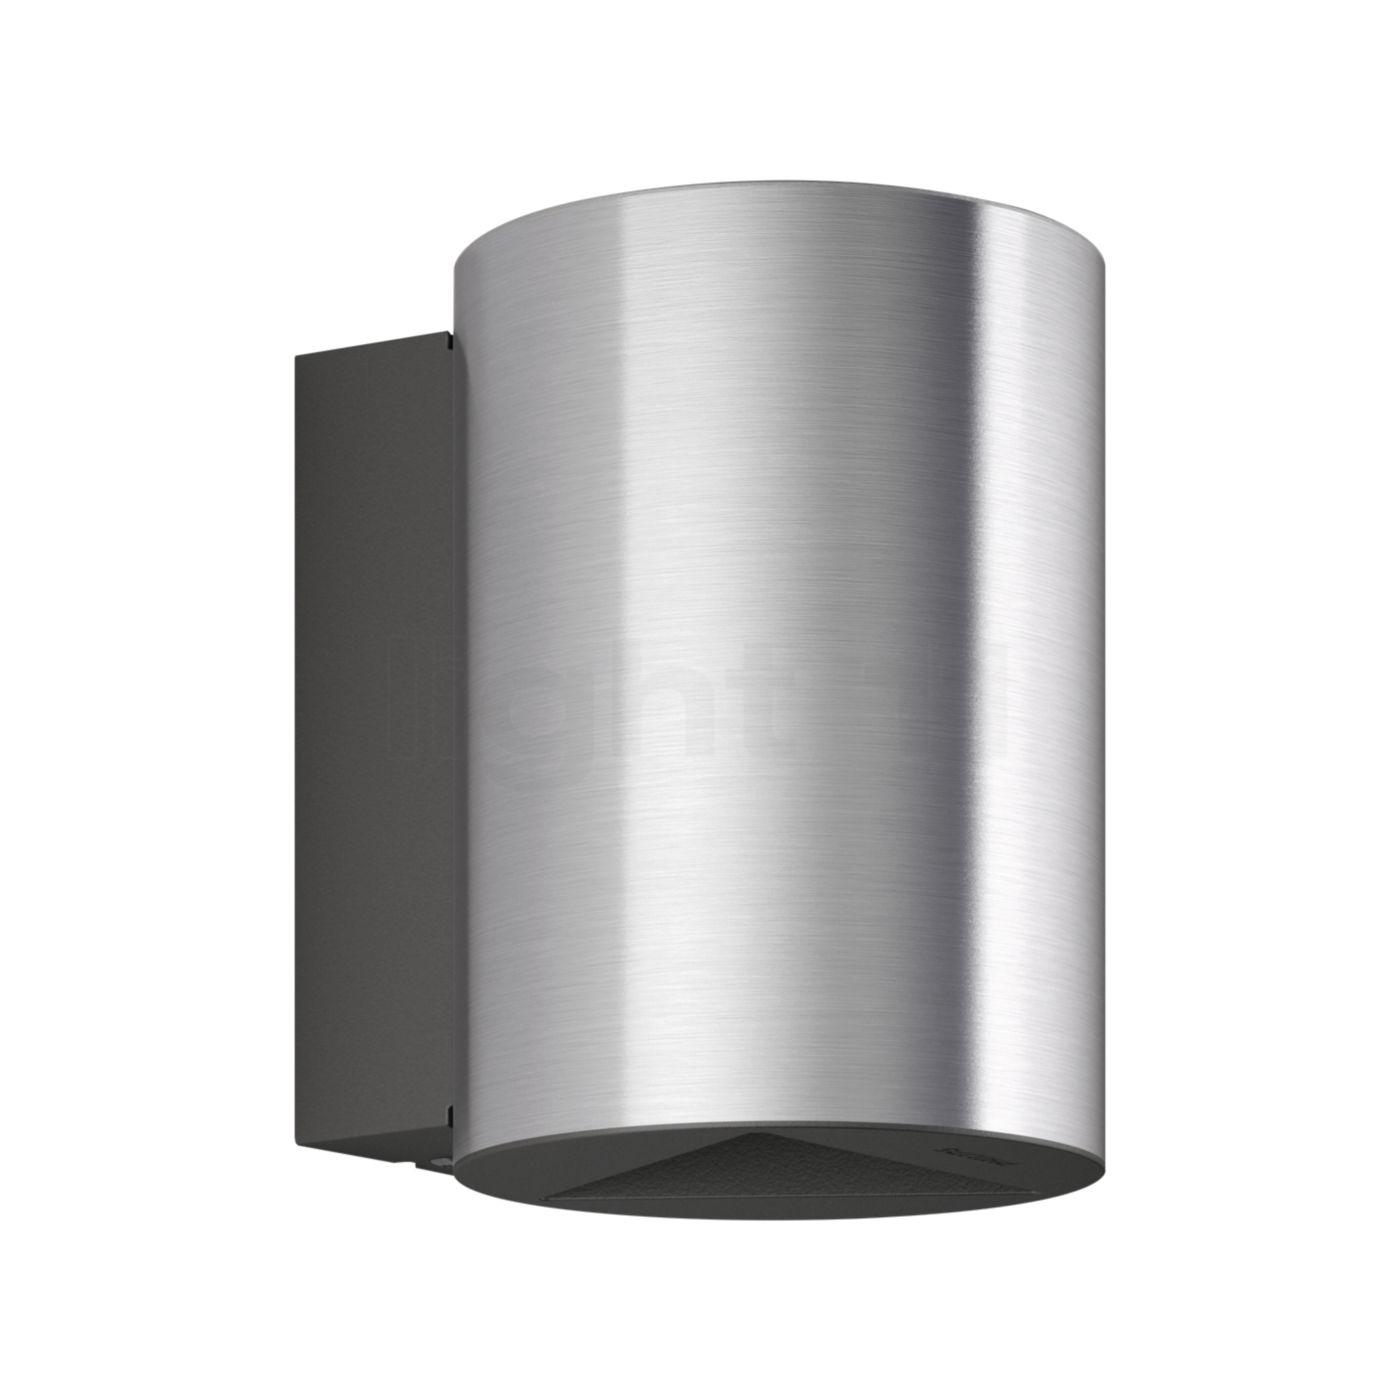 Buy philips mygarden buxus wall light led at light11 aloadofball Choice Image